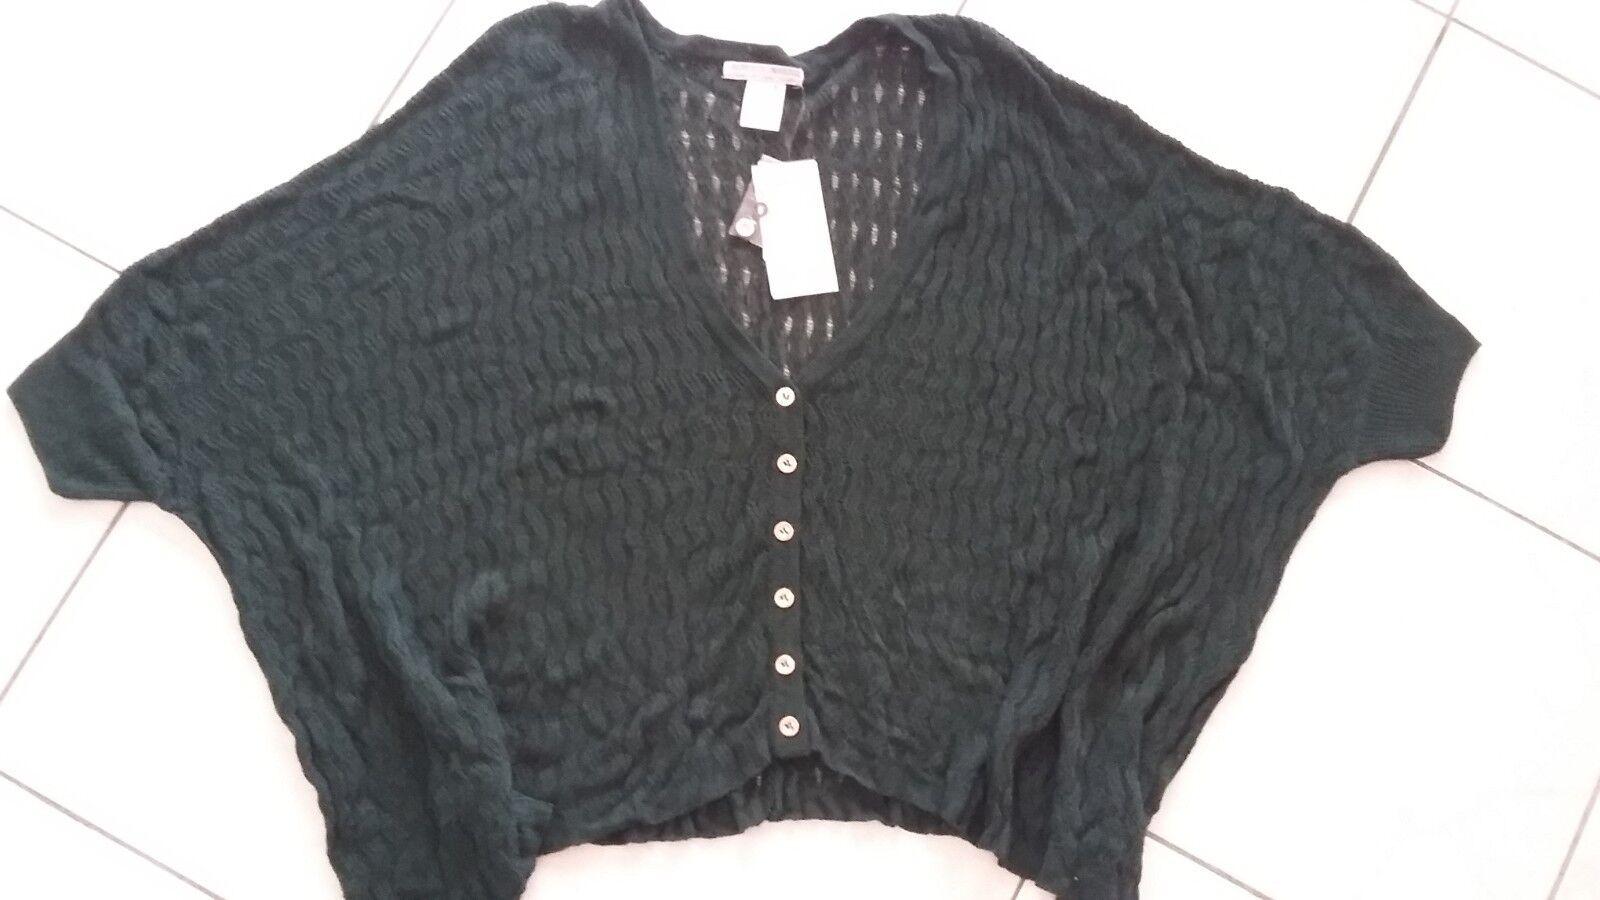 Ladies NWT Alberto Makali Sweater crochet knit swing top size Small green